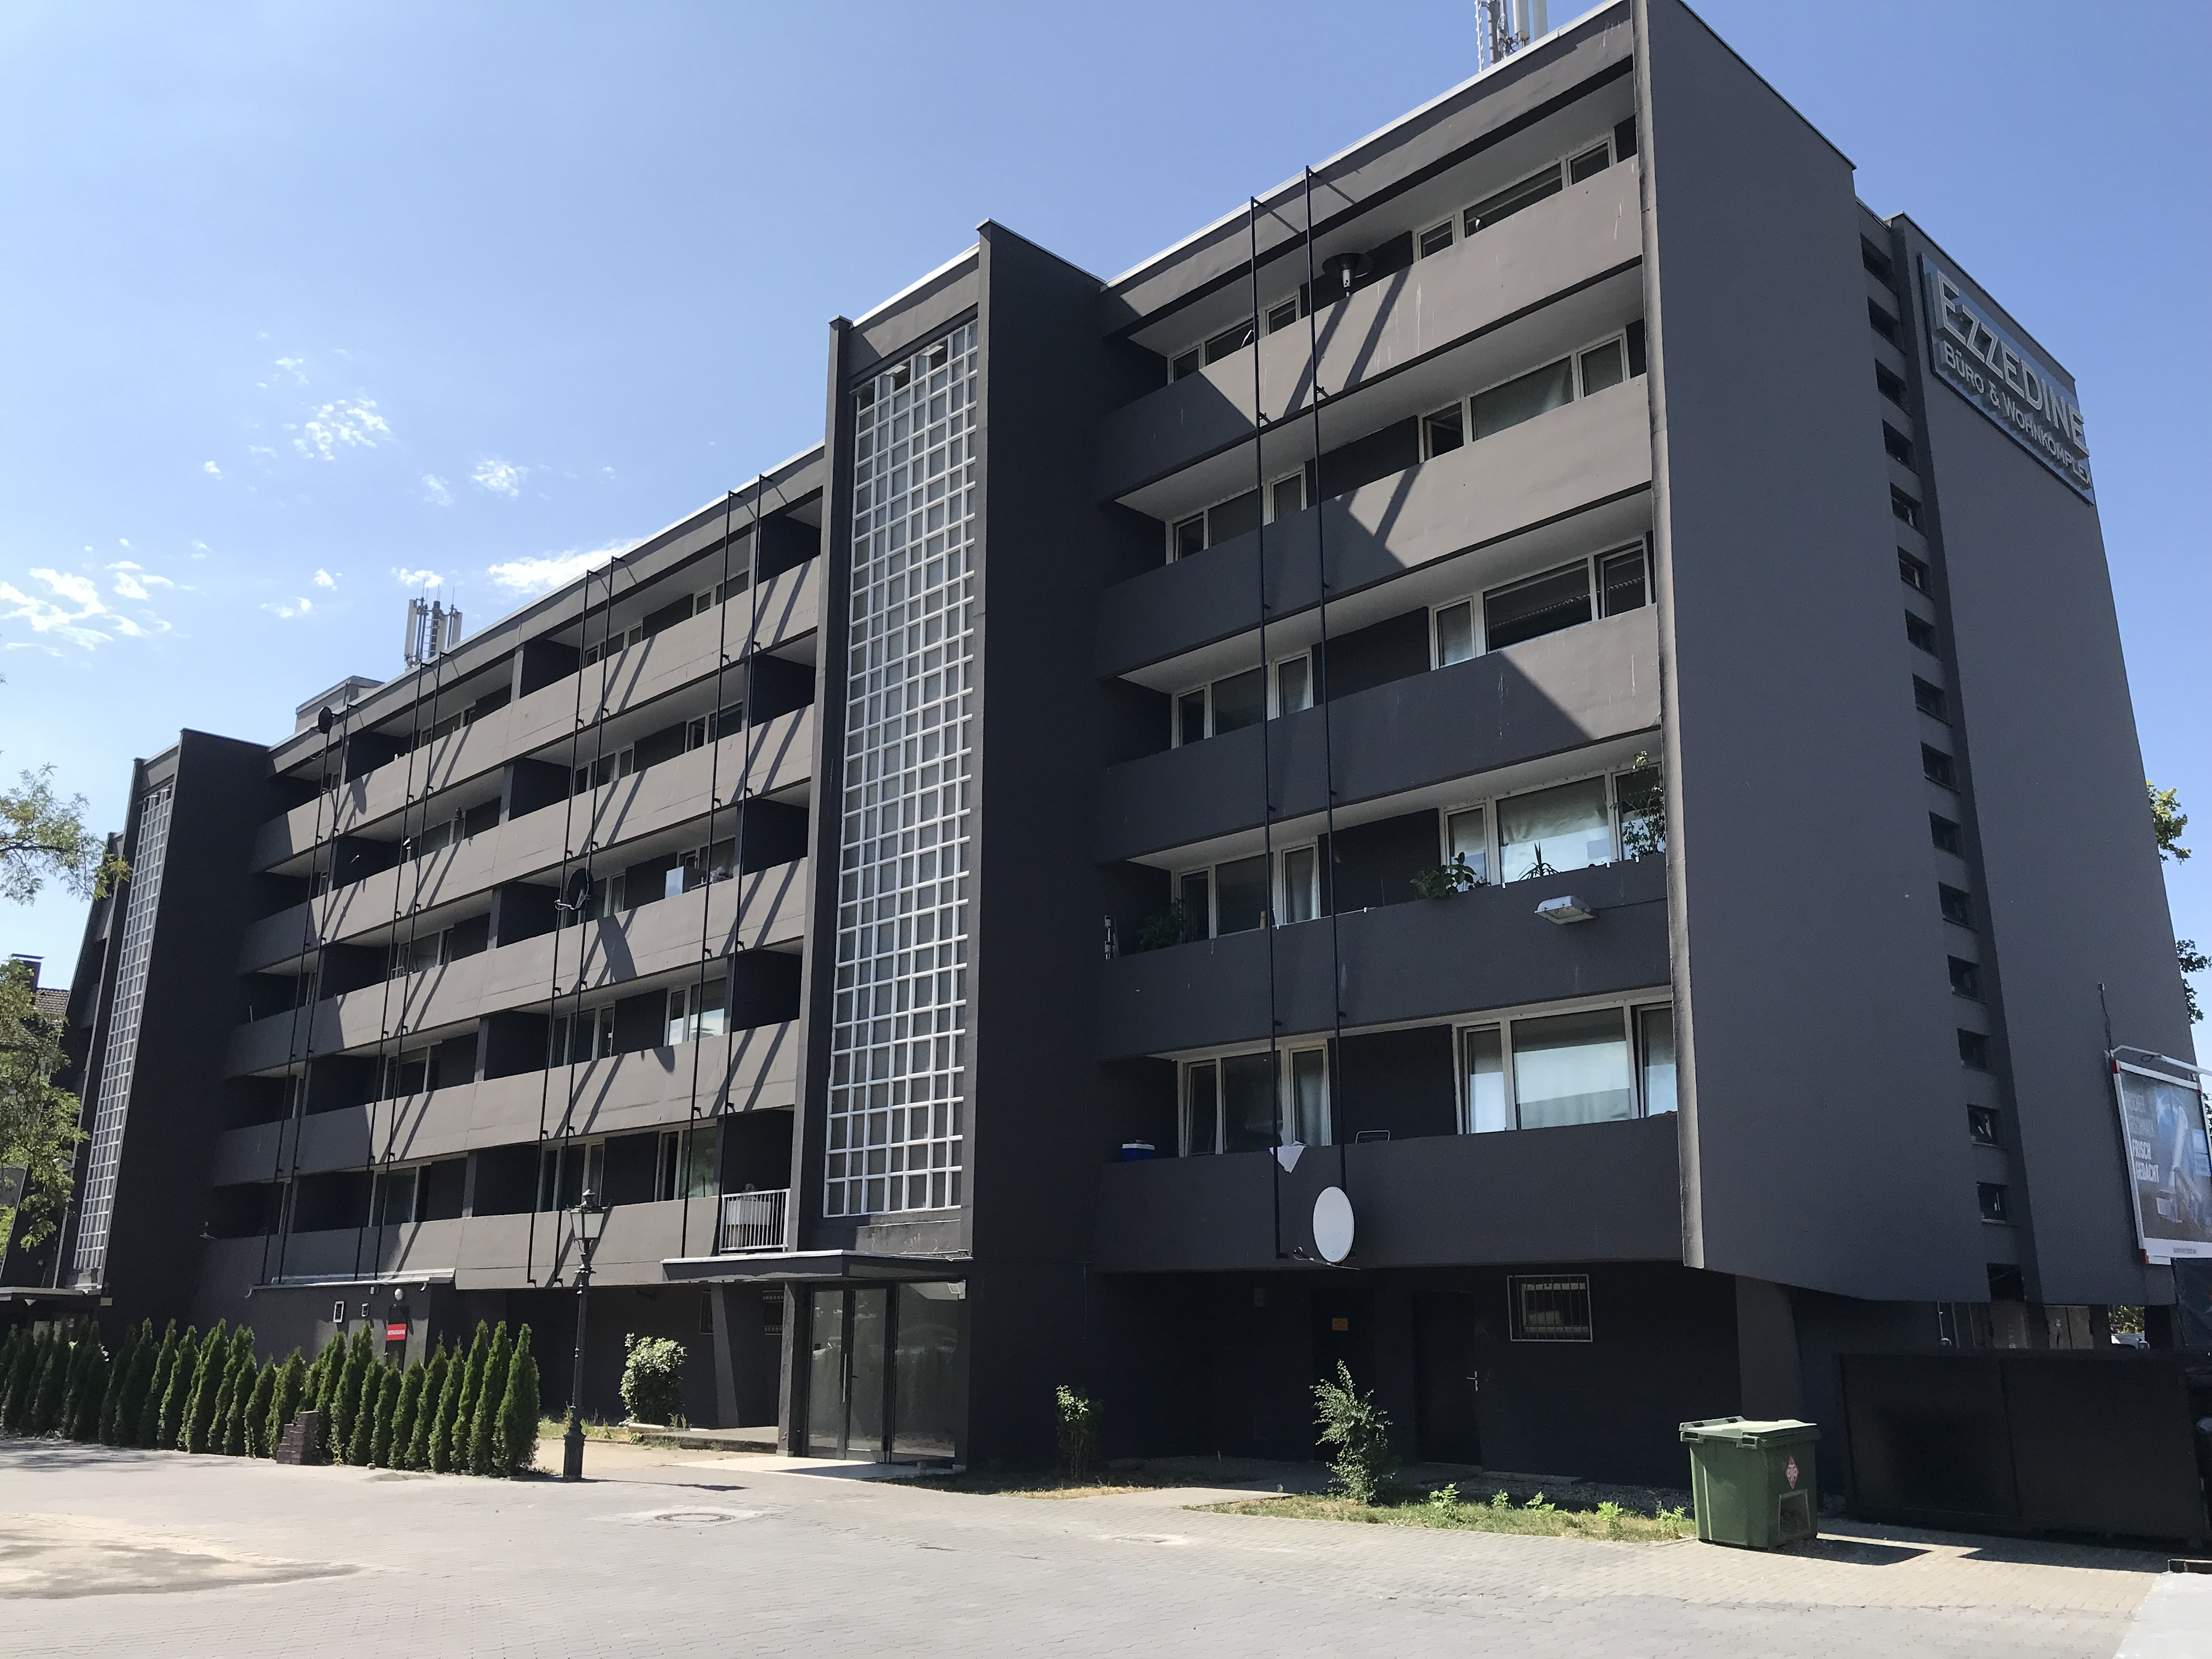 neue Immobilie der Protectum eG